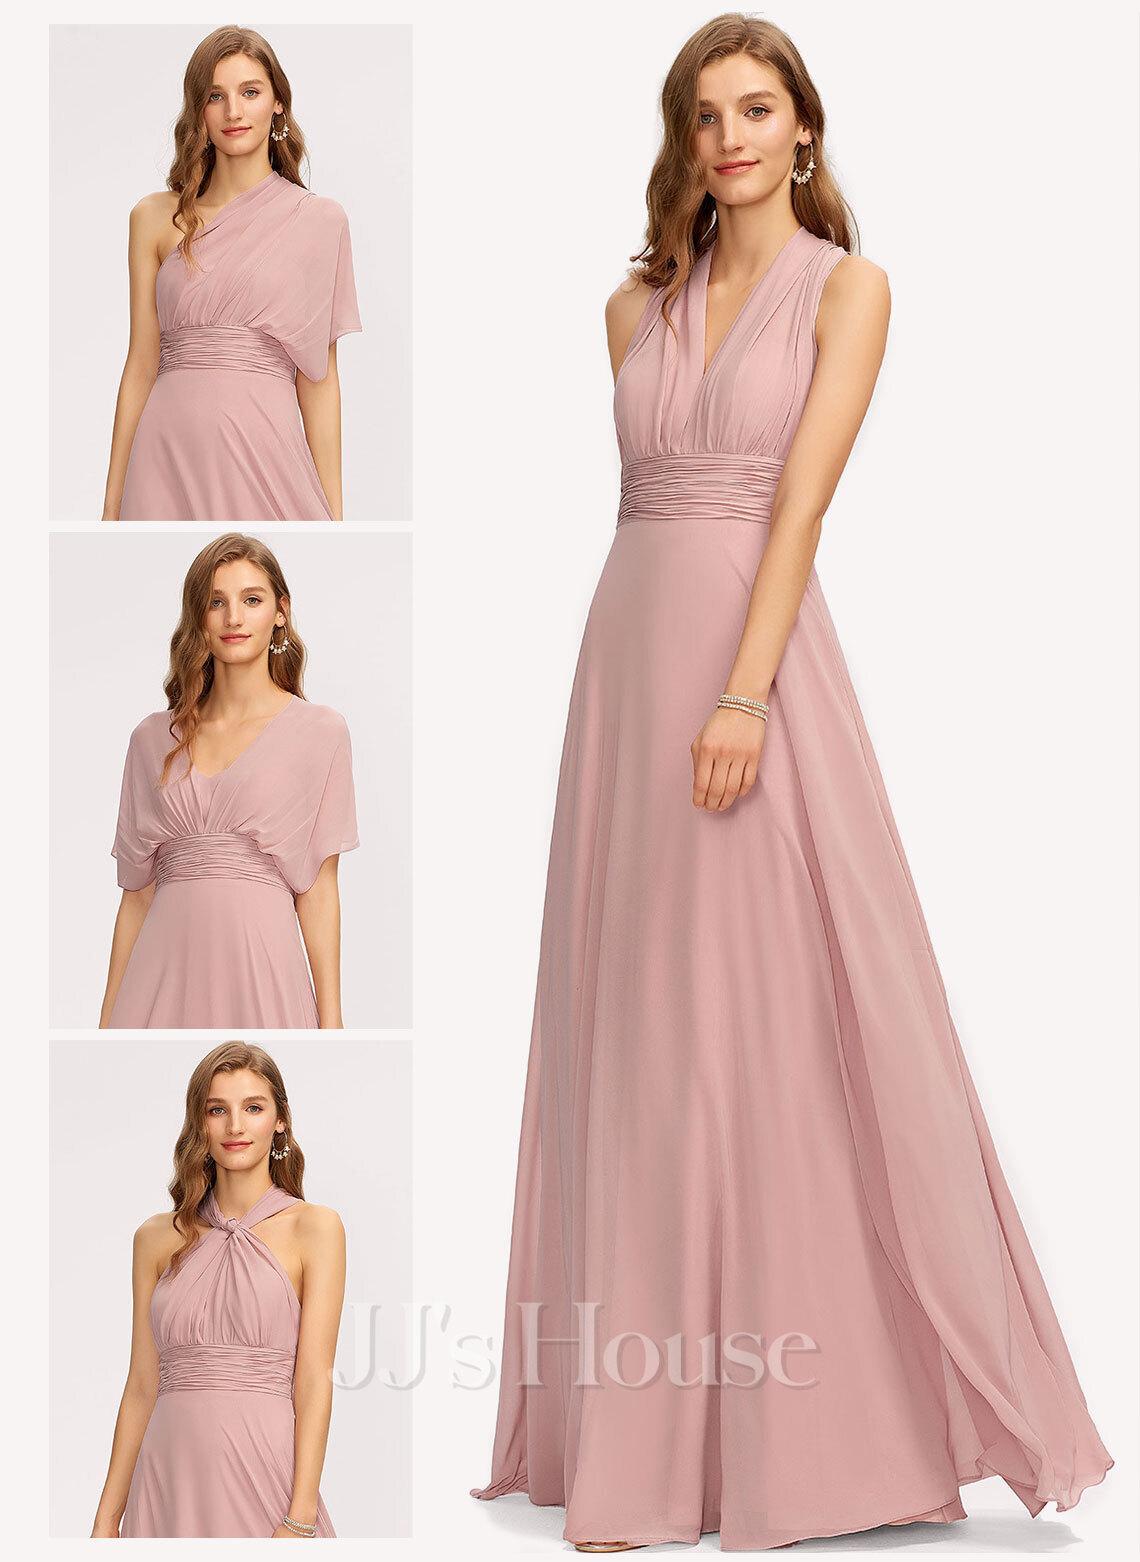 A-Line One-Shoulder Halter V-neck Floor-Length Chiffon Bridesmaid Dress With Ruffle